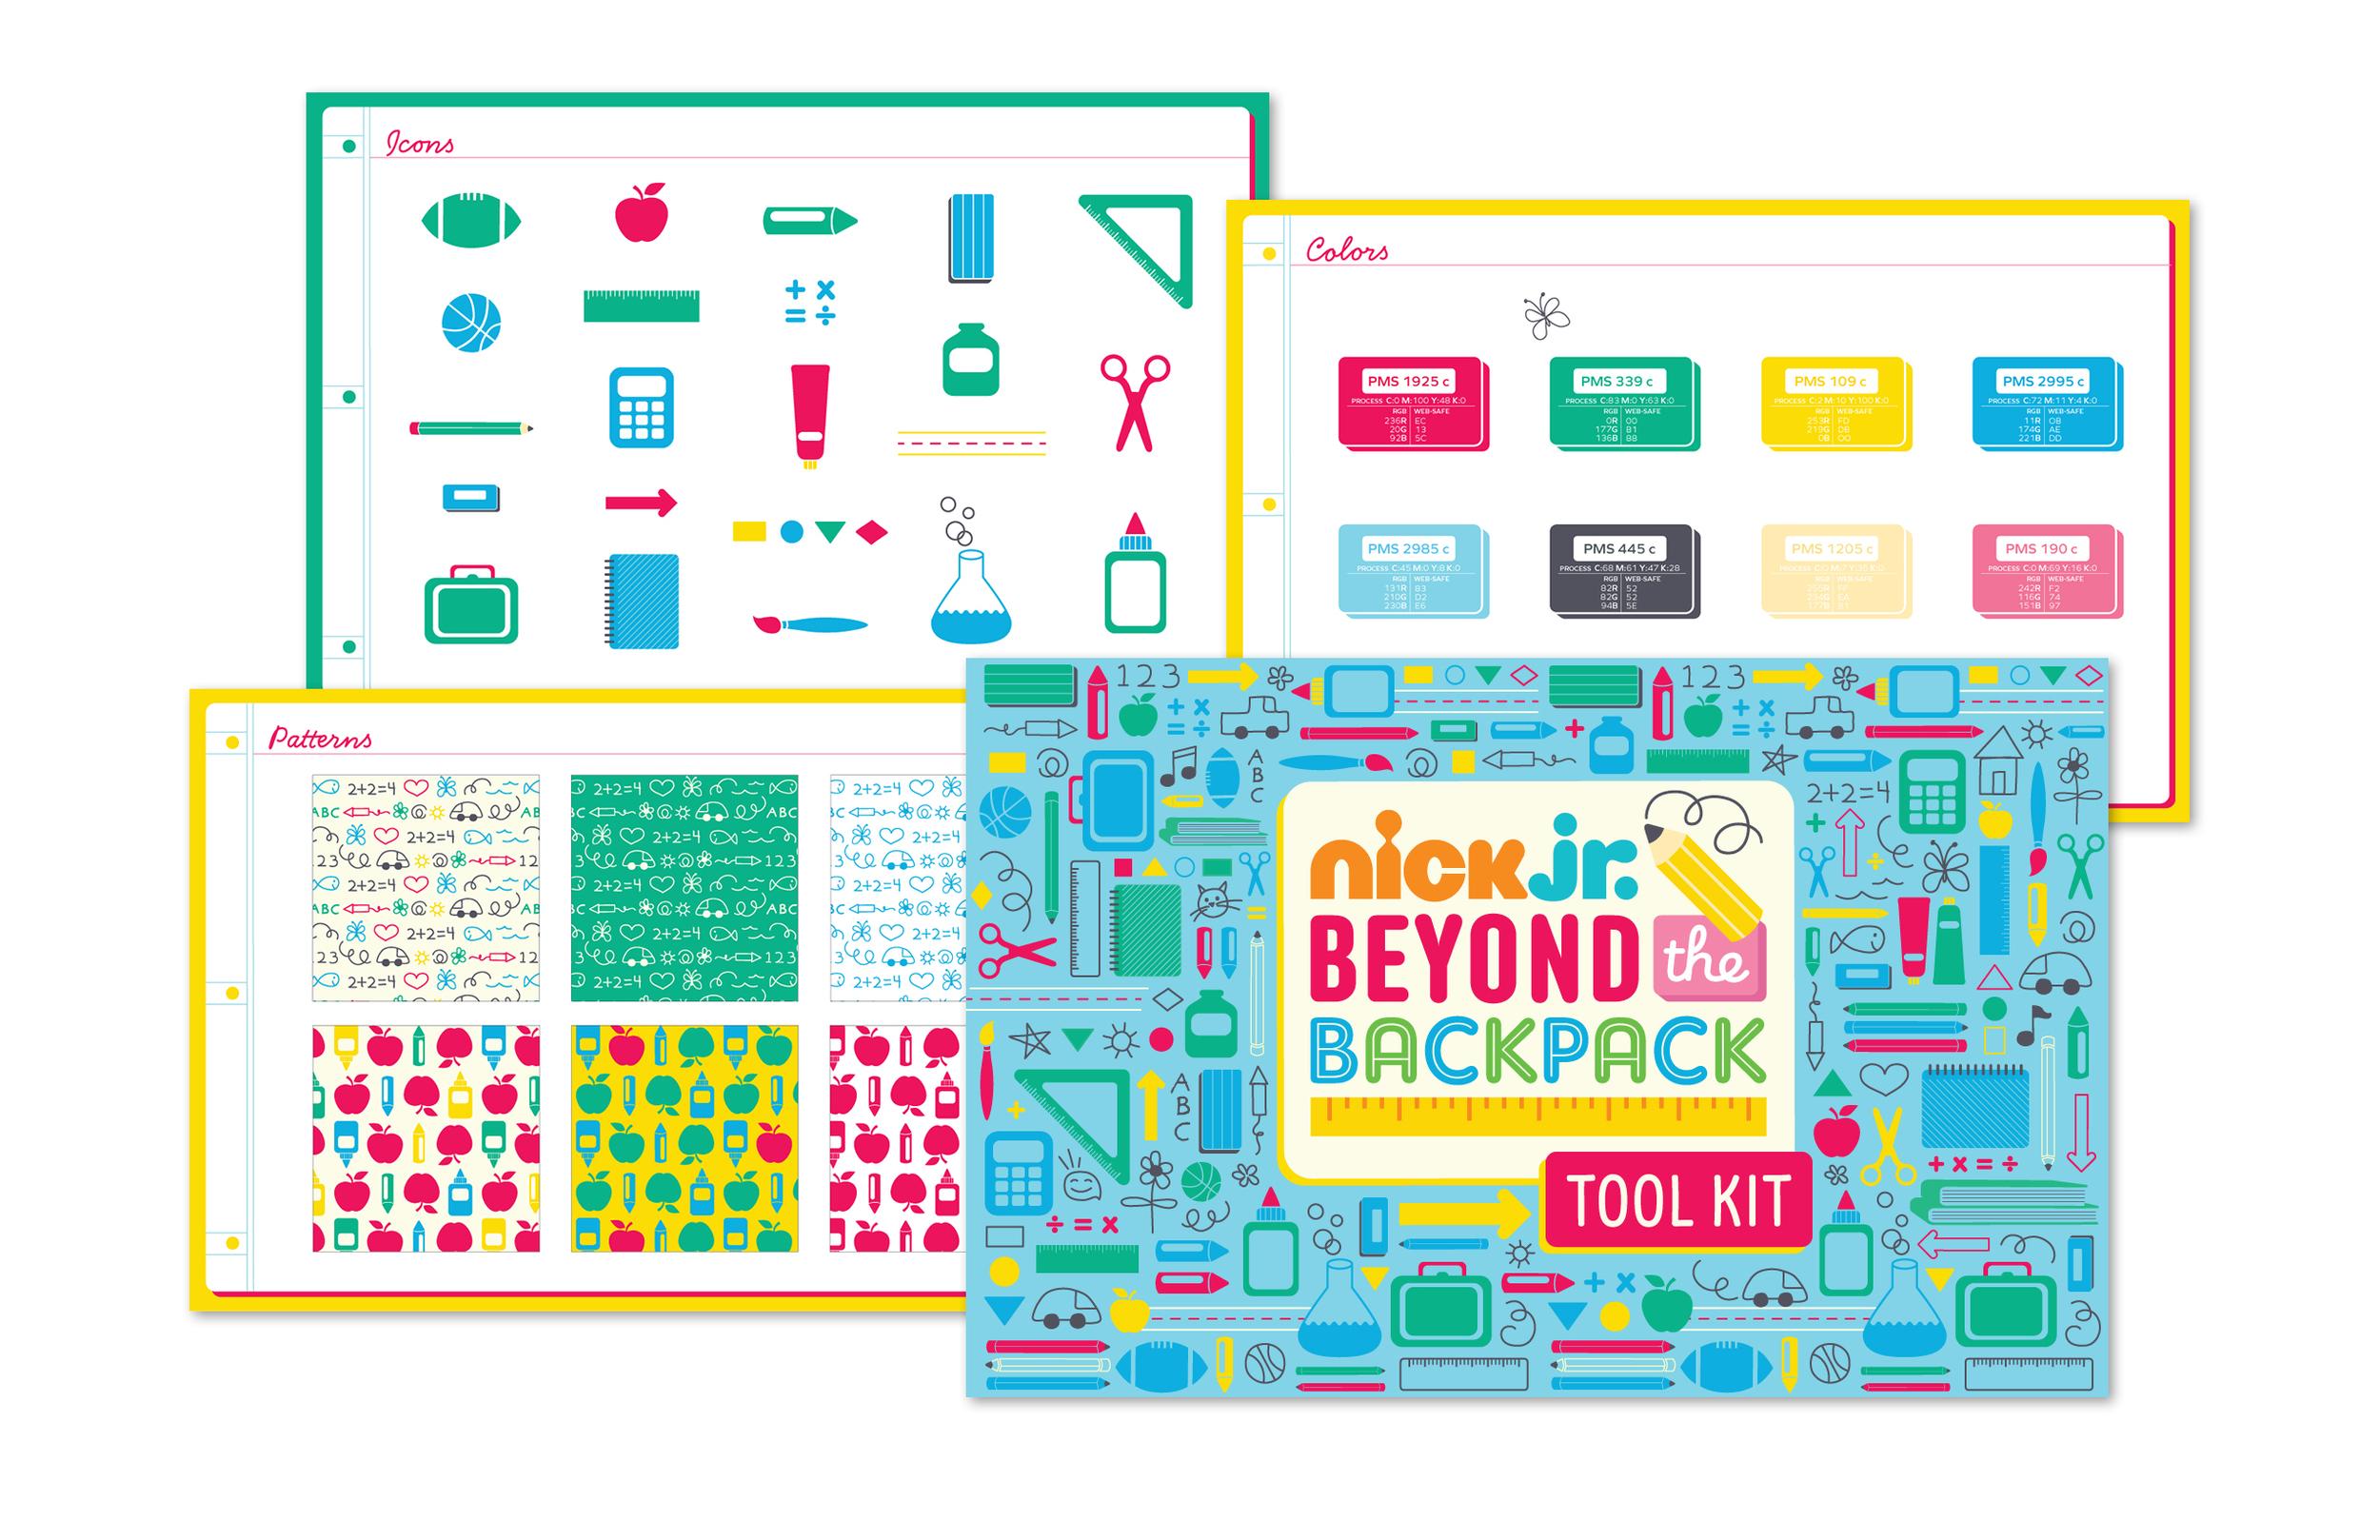 Nick Jr.'s Beyond the Backpack Tool Kit